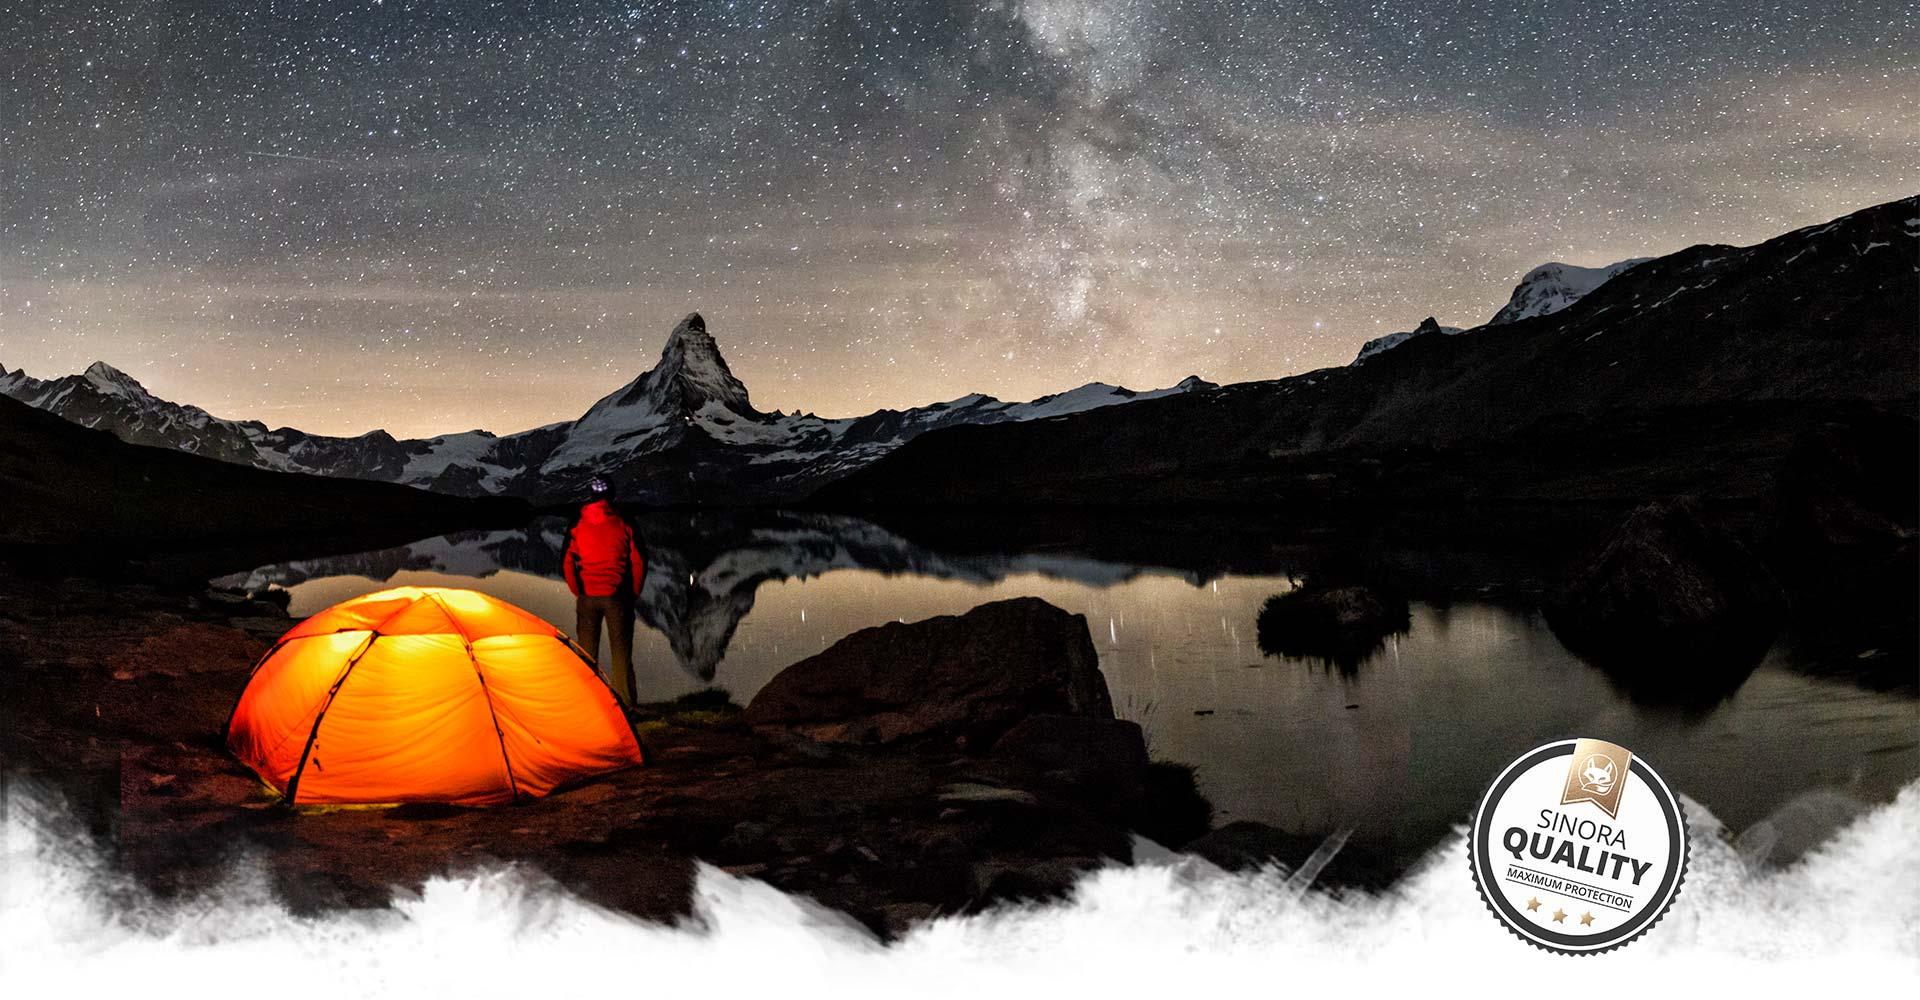 SINORA Cases Outdoor Matterhorn